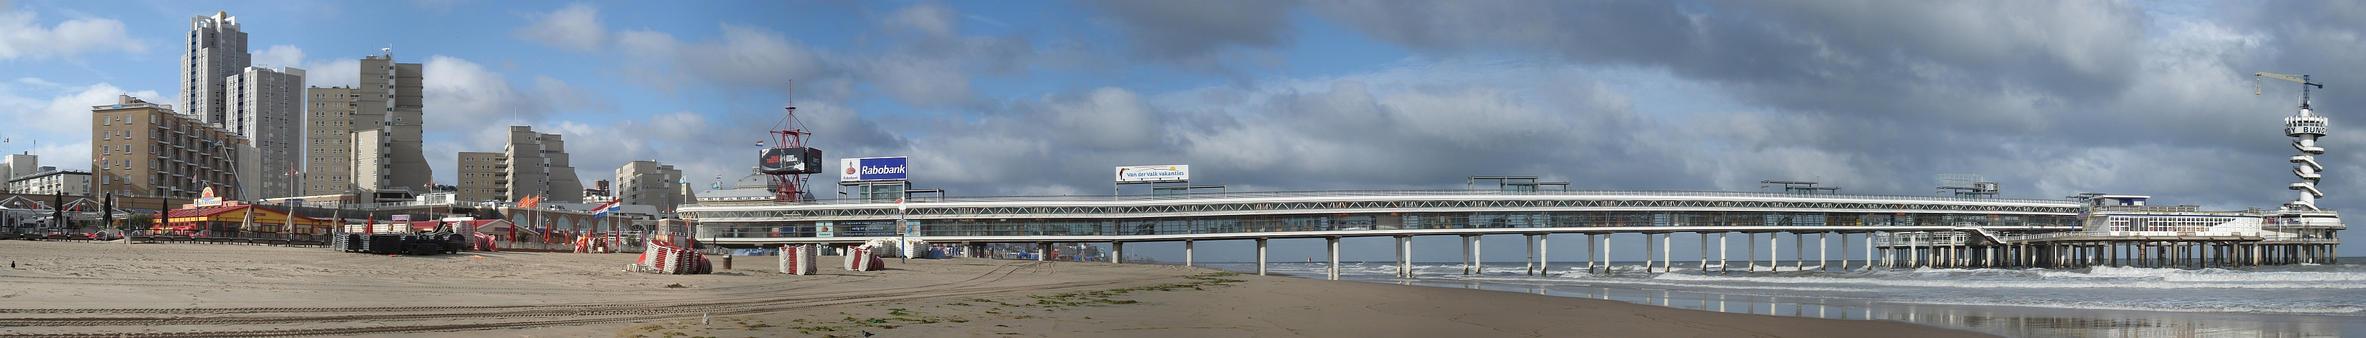 Pier by TopDroPics